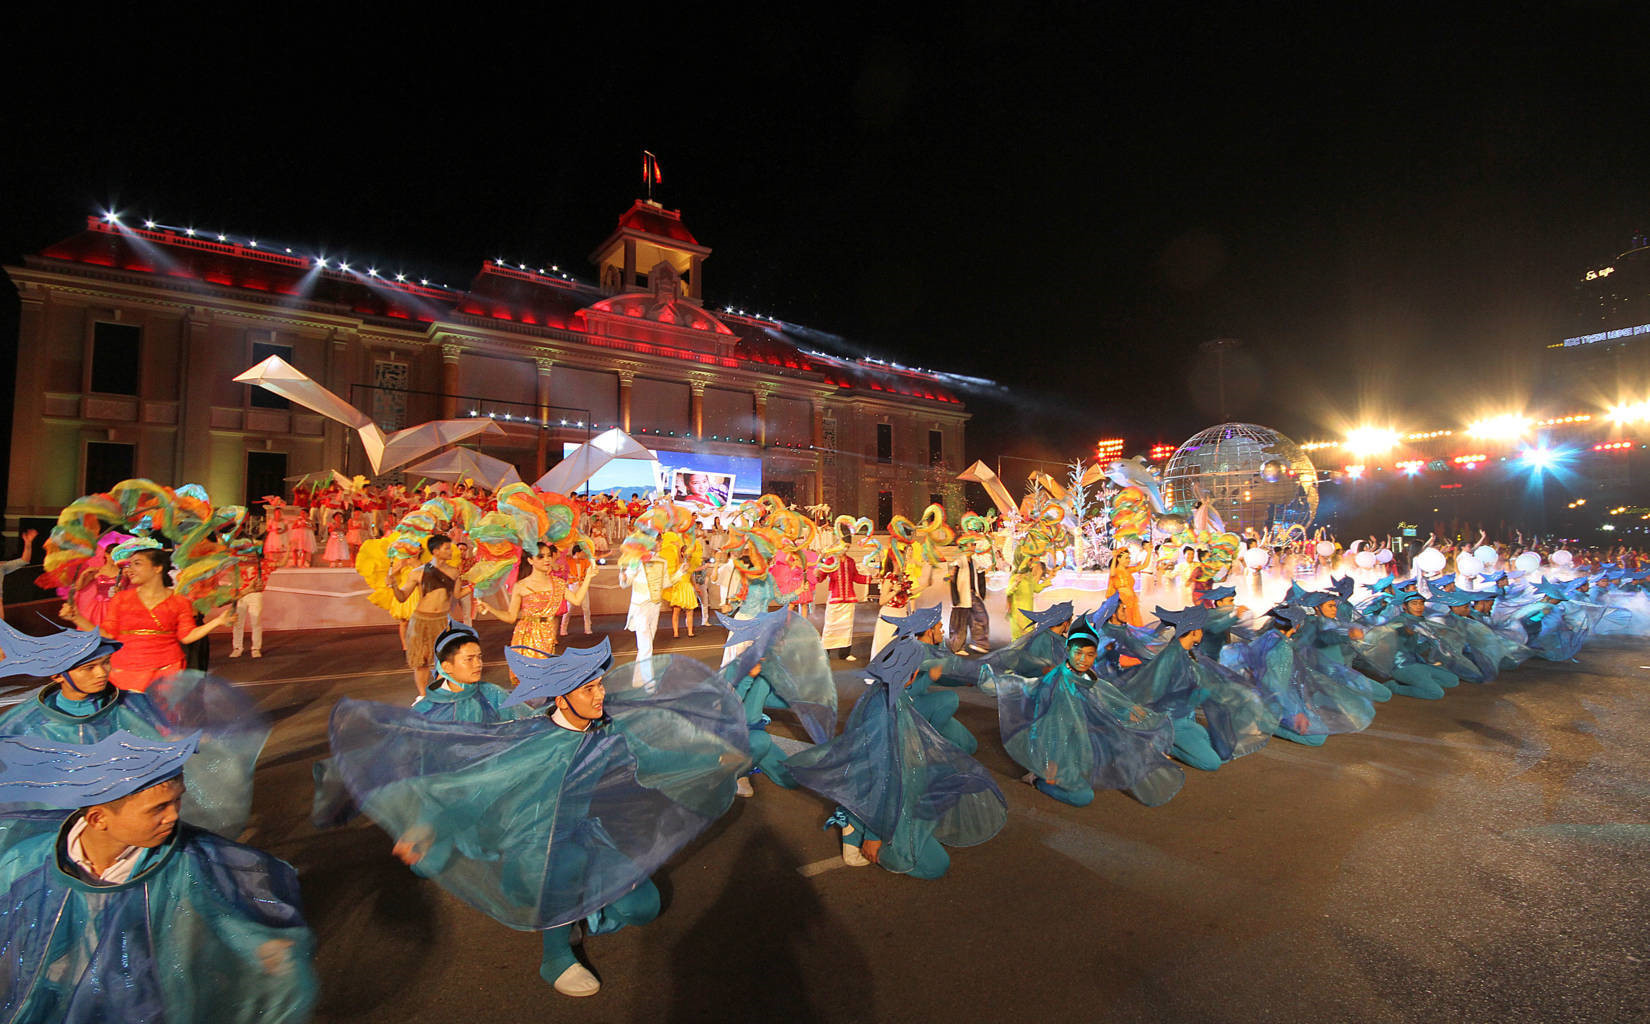 Lung linh festival biển Nha Trang